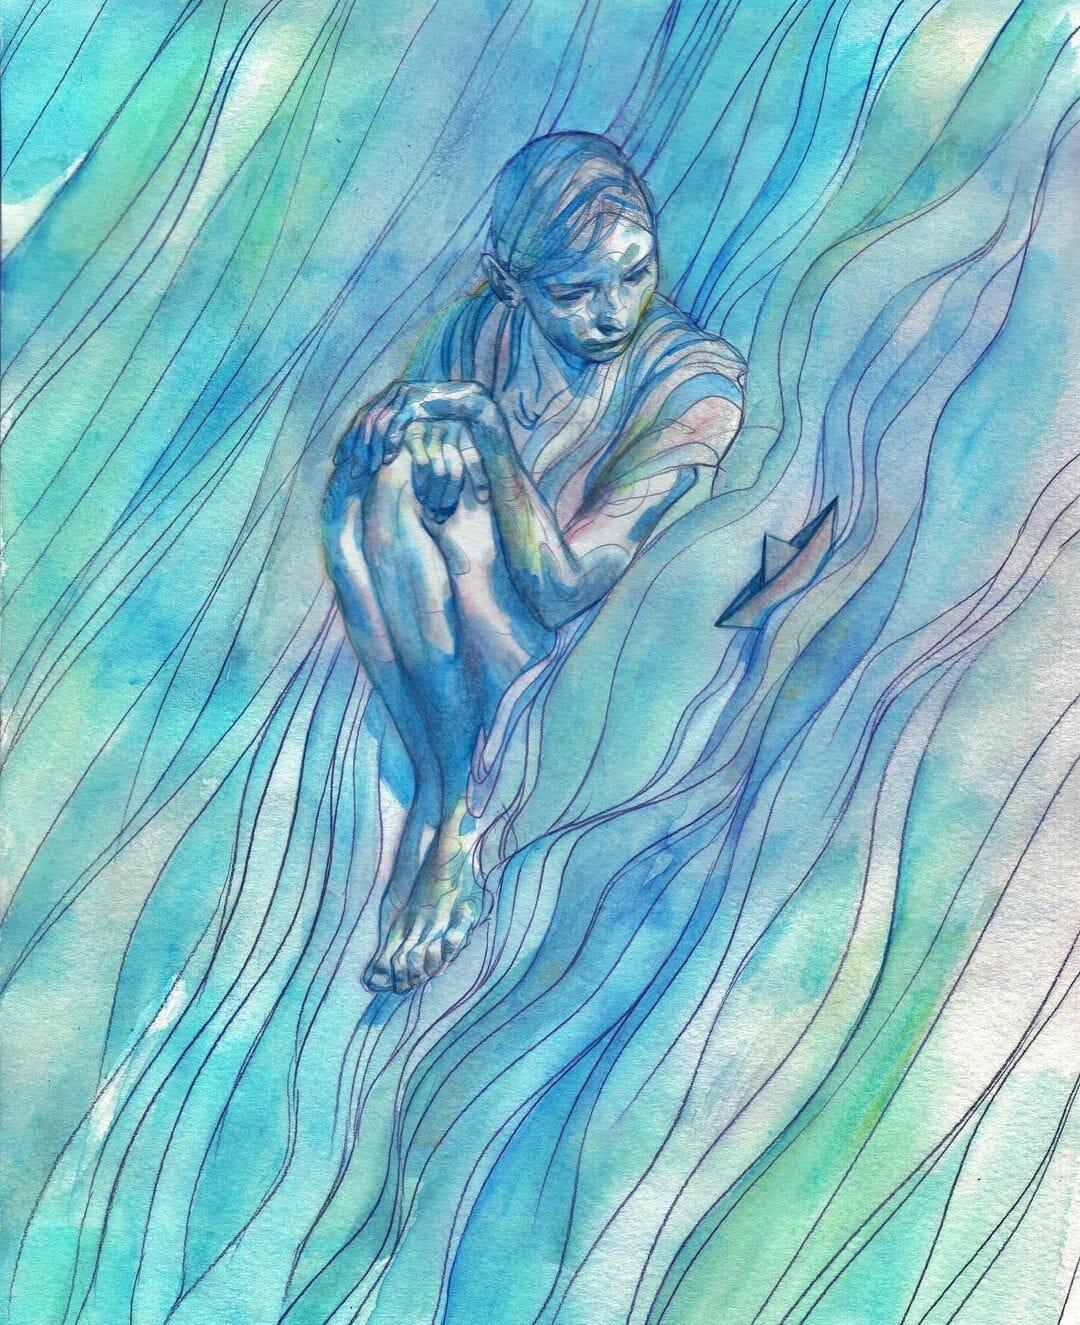 Illustration teintée de bleu réalisée par Eliza Ivanova